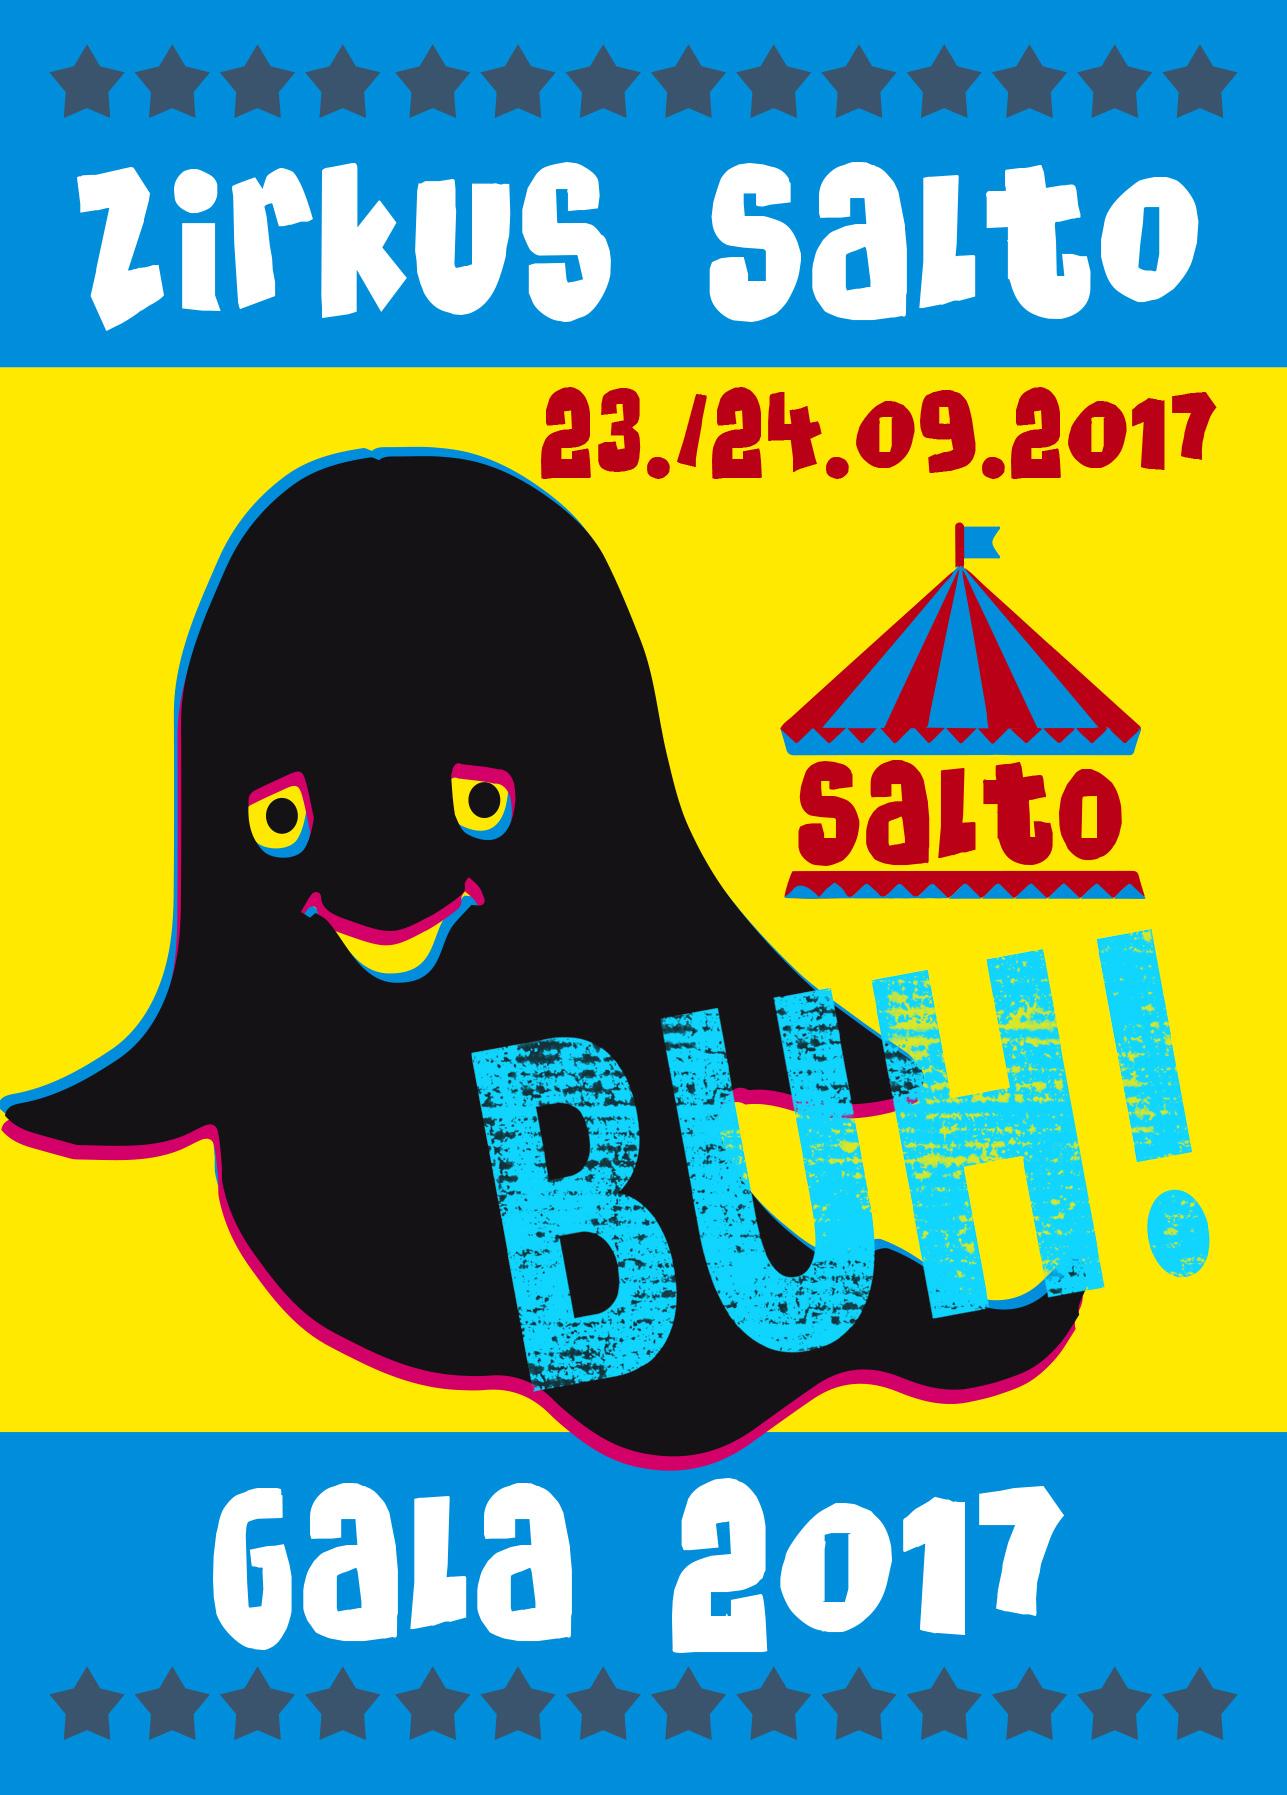 BUH! GALA 2017 – 23.09. + 24.09.